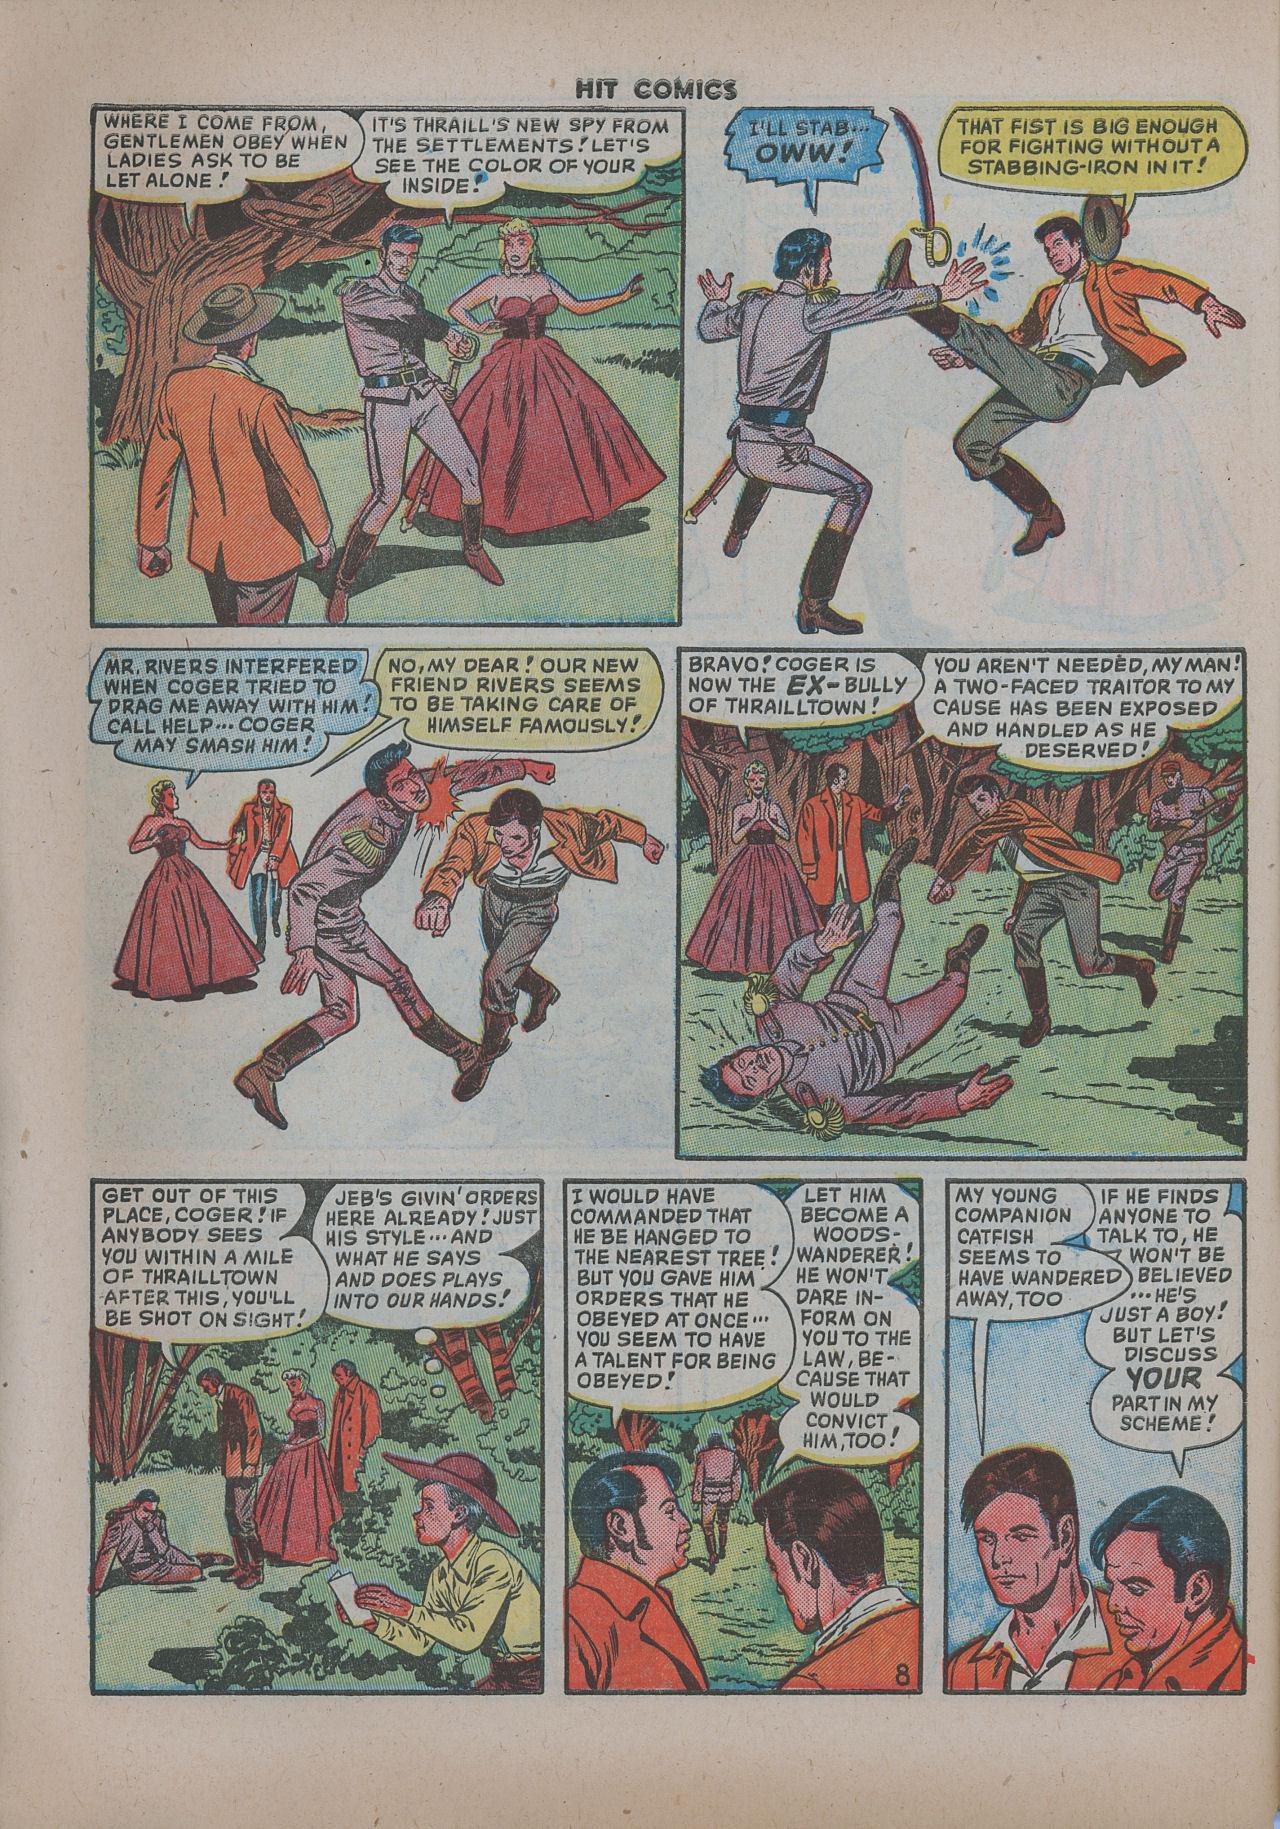 Read online Hit Comics comic -  Issue #62 - 11